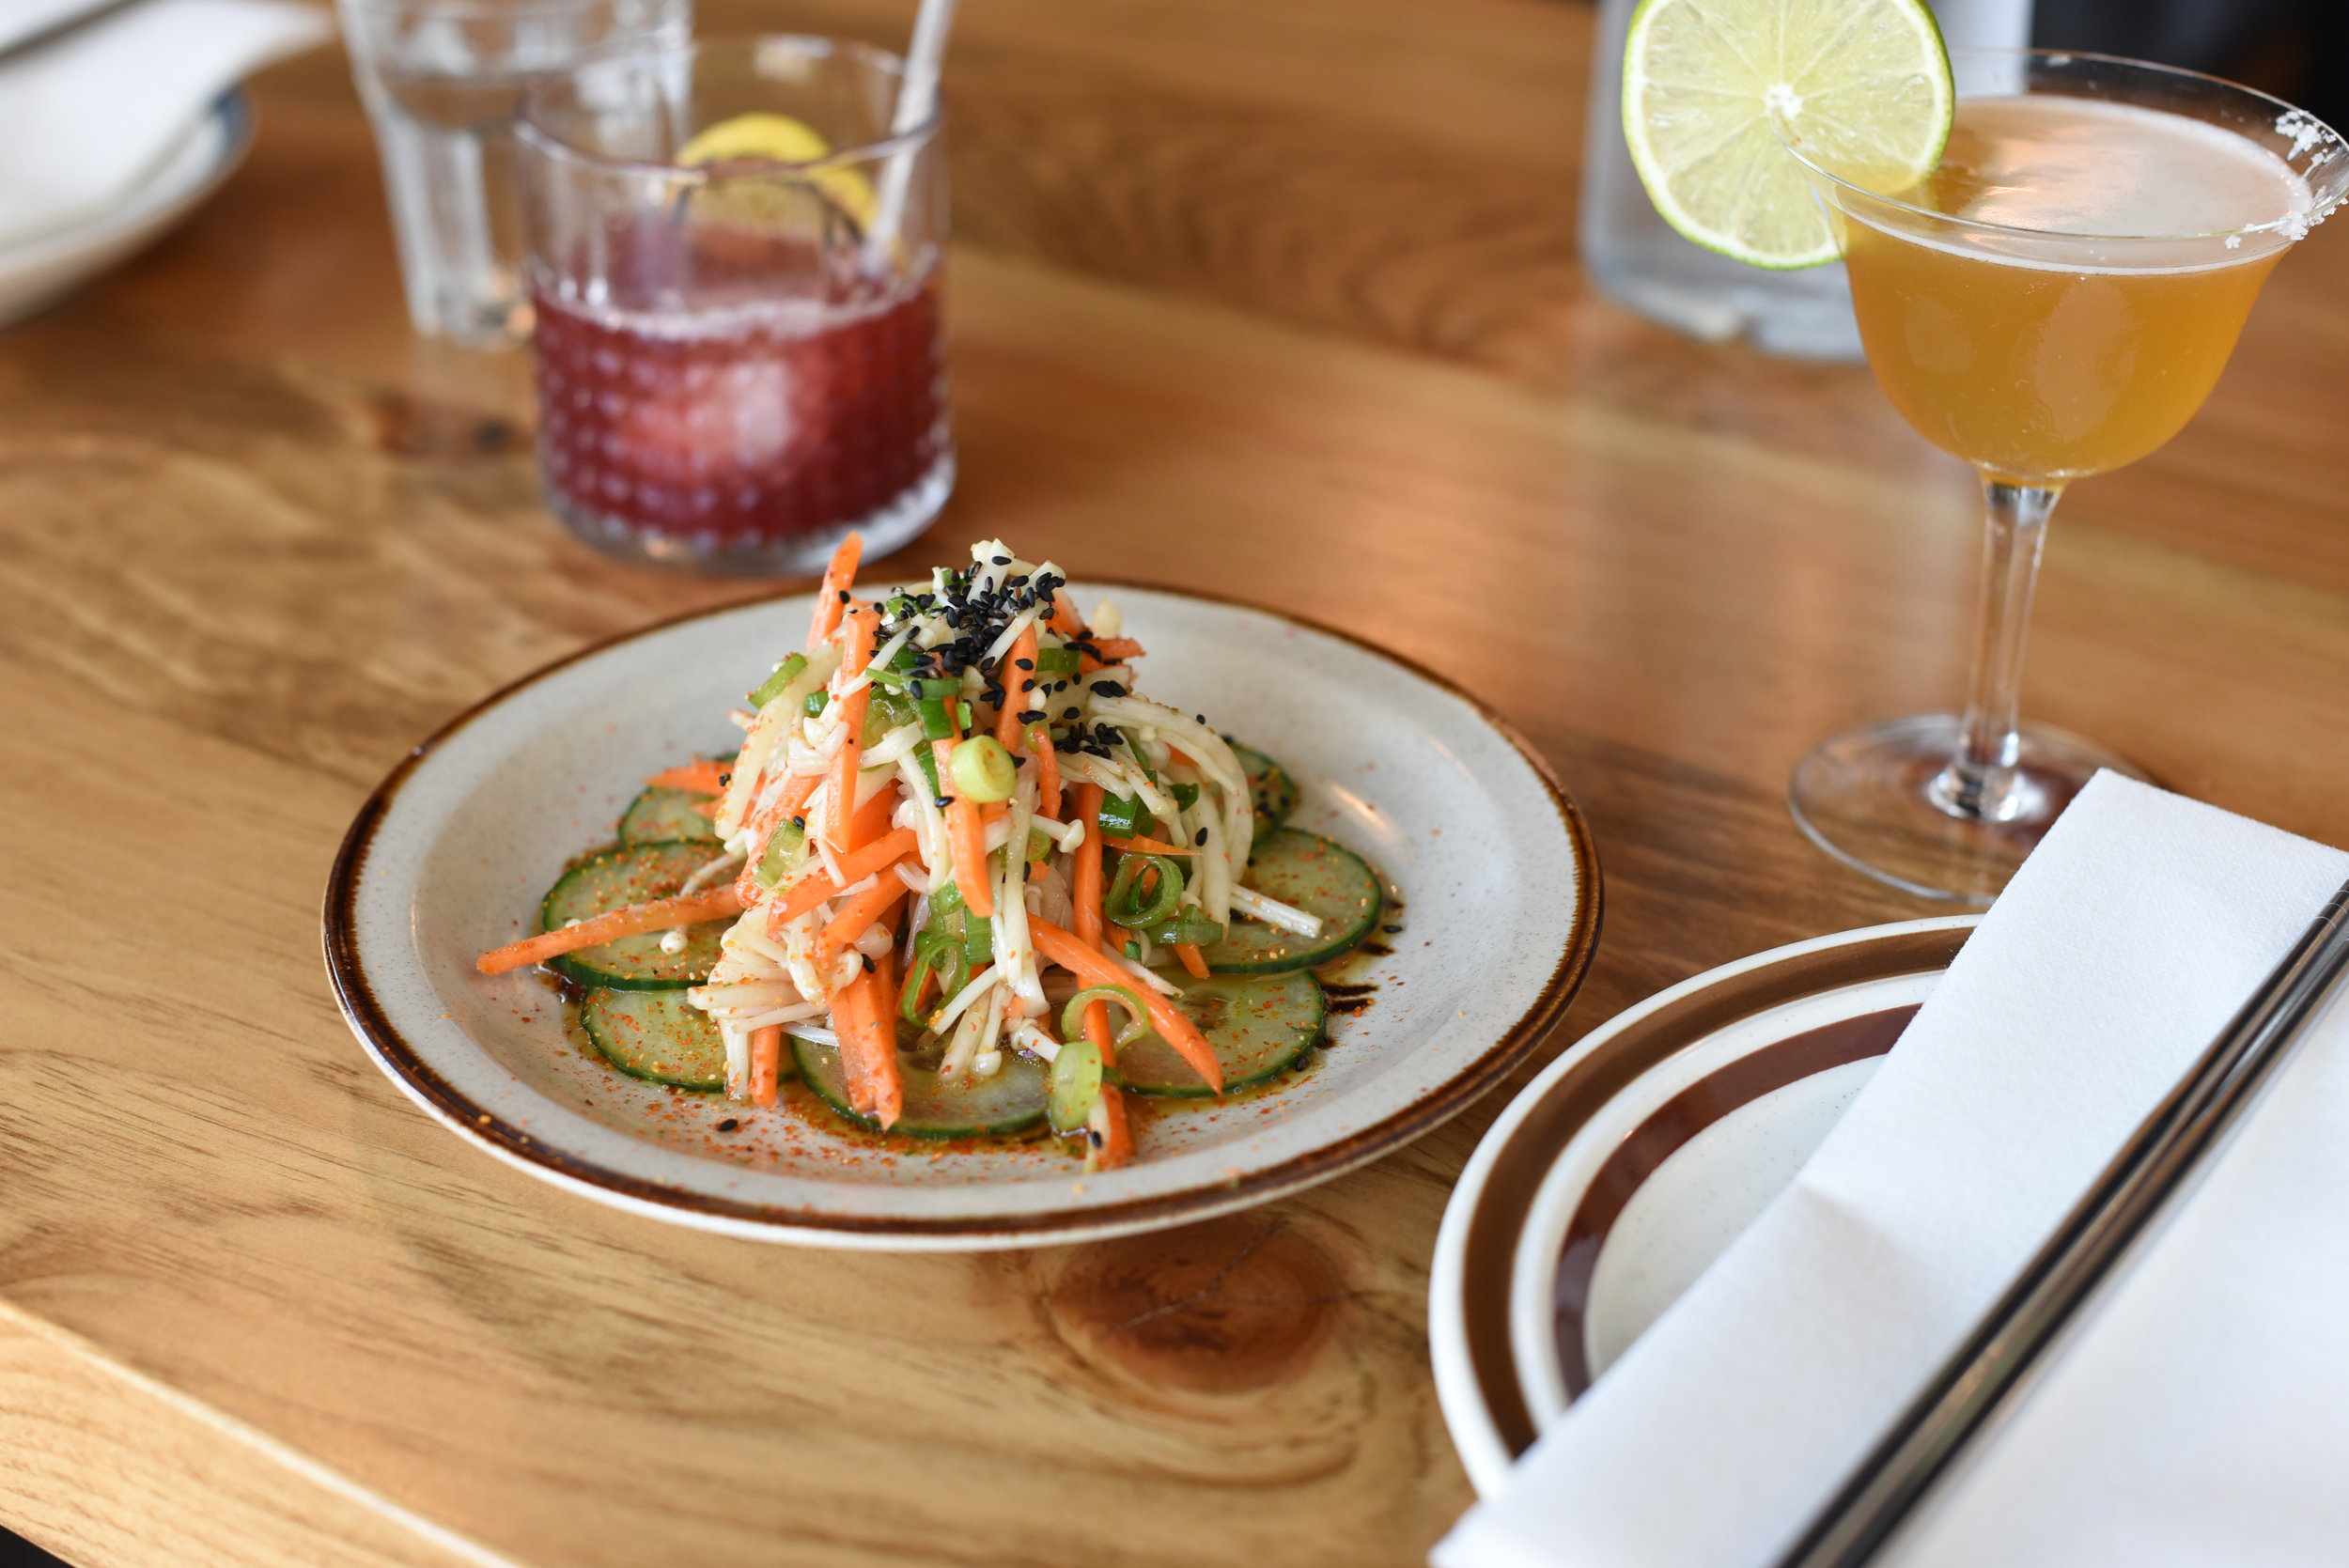 Enoki Salad - pickled enoki mushrooms, crisp veg, & sesame.